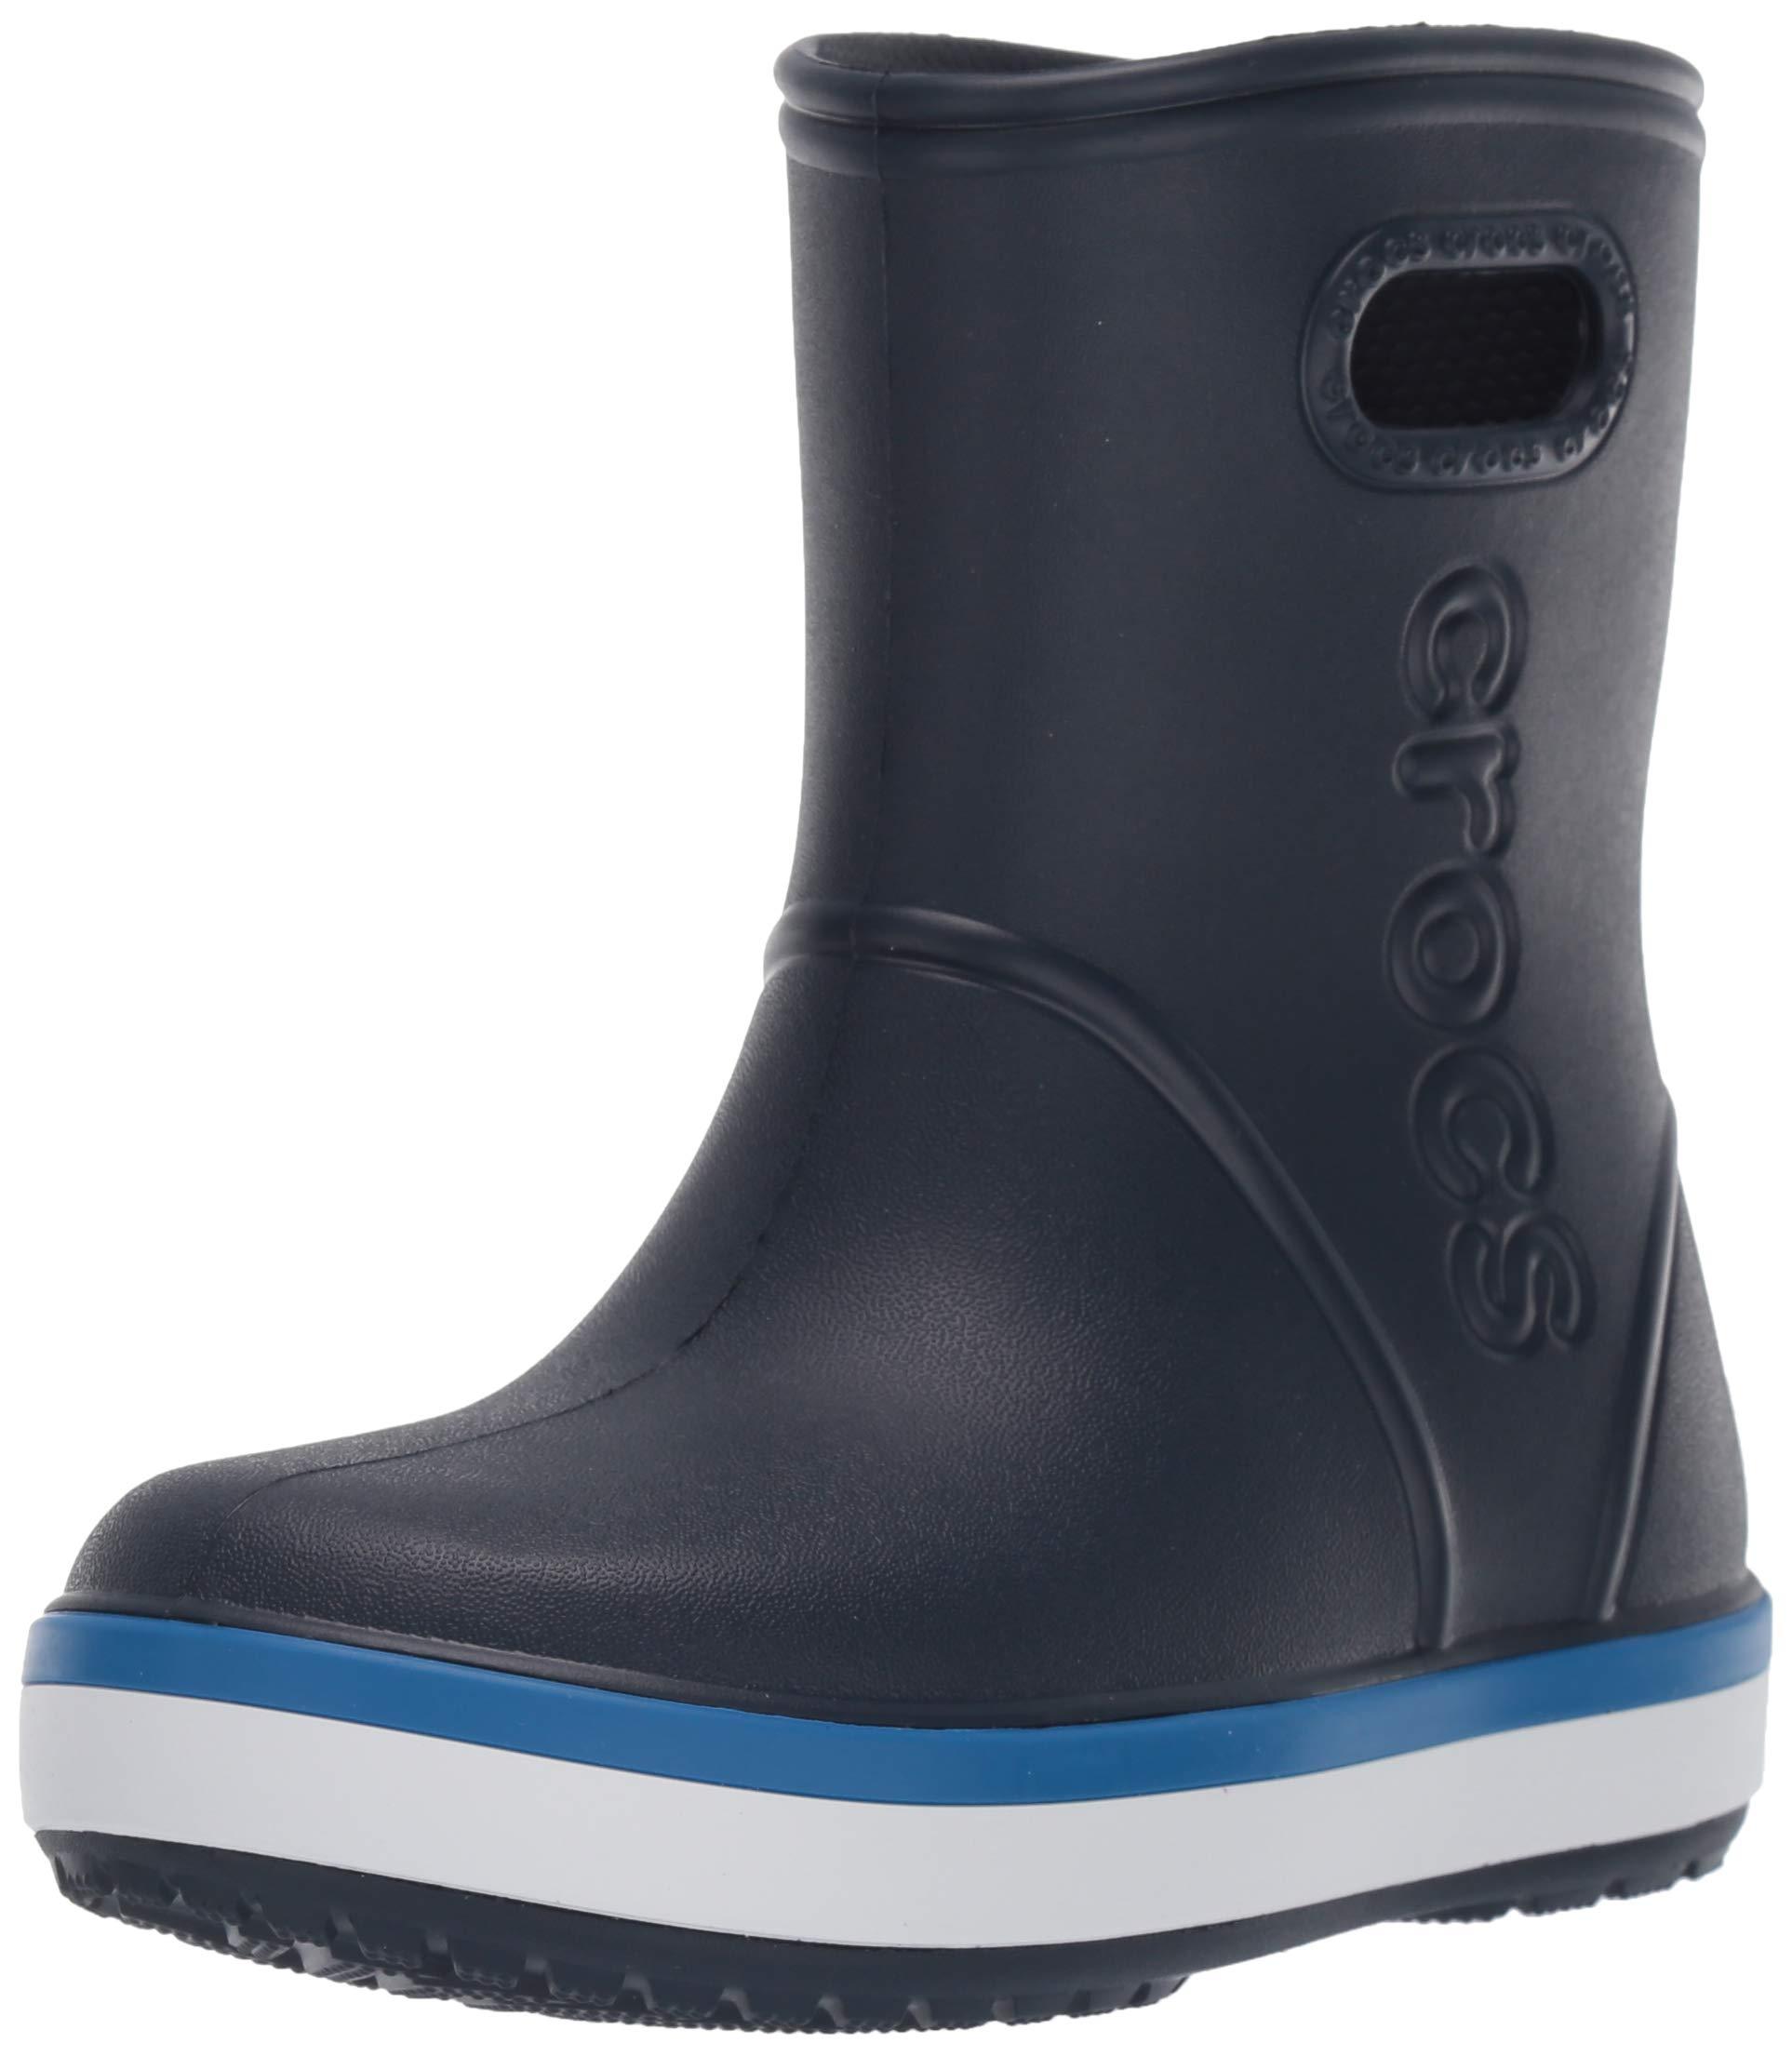 Crocs Unisex Crocband Rain Boot, Navy/Bright Cobalt, 2 M US Little Kid by Crocs (Image #1)